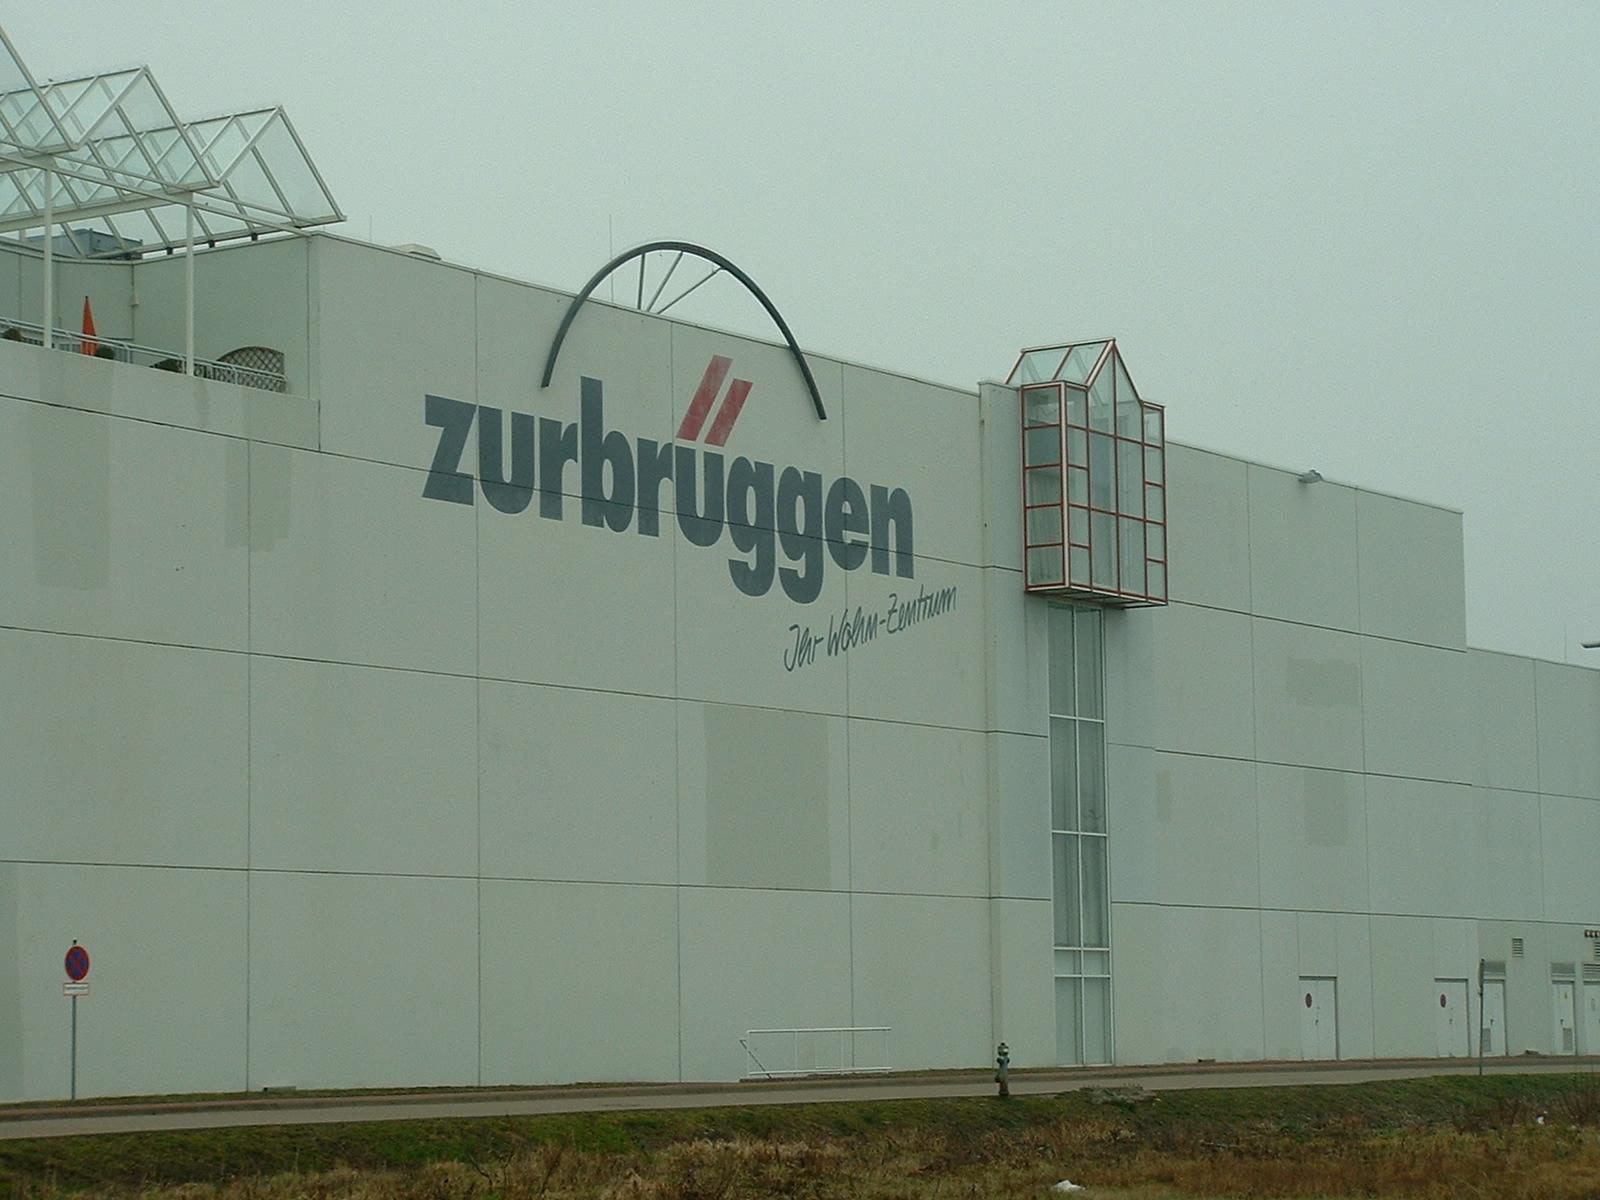 Zurbrüggen Wohn Zentrum Gmbh 27755 Delmenhorst Hasportannenheide